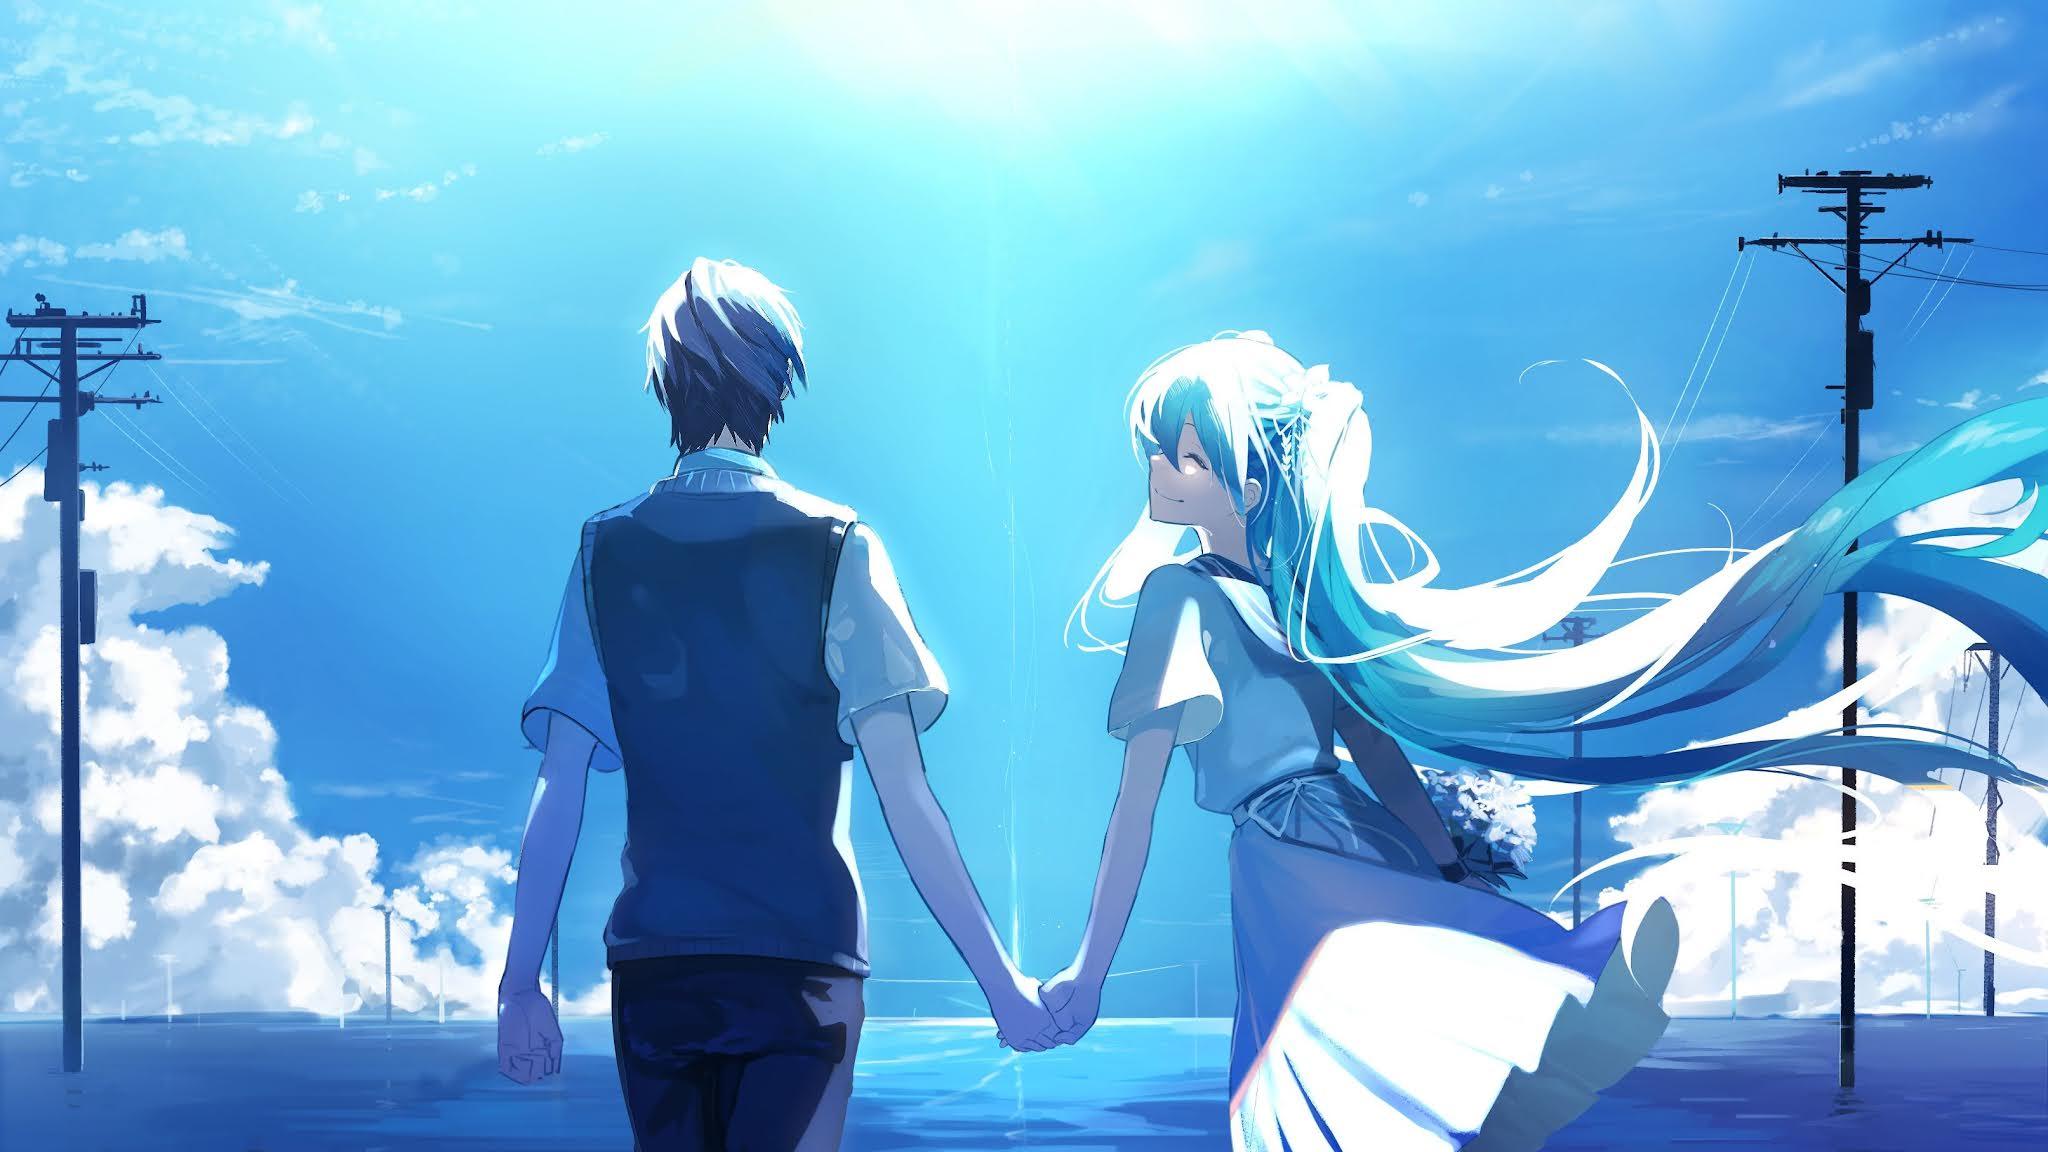 anime romance wallpapers